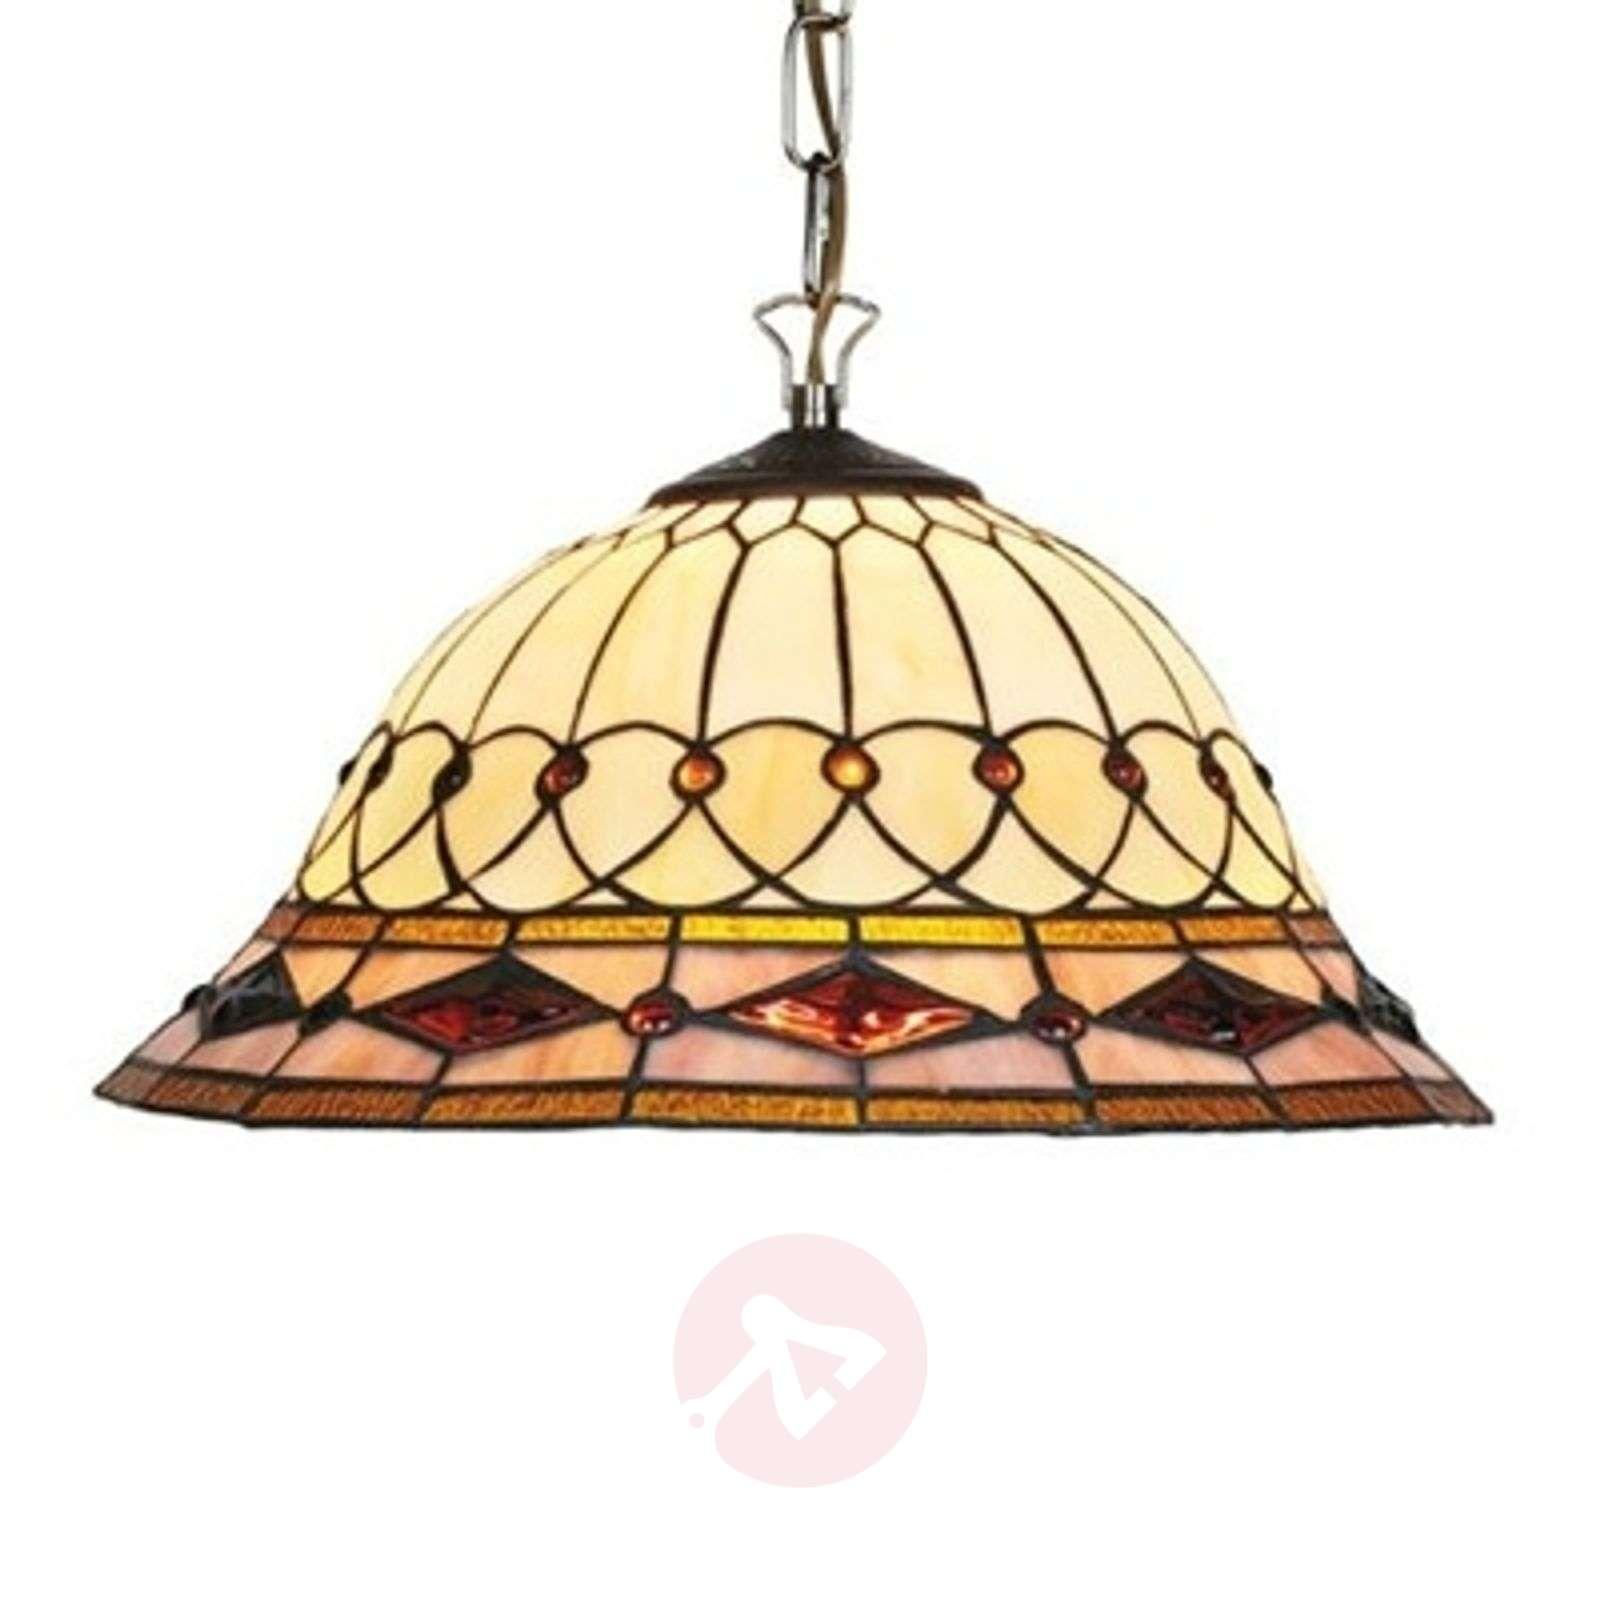 Hanging light Kassandra, Tiffany-style-1032112X-01